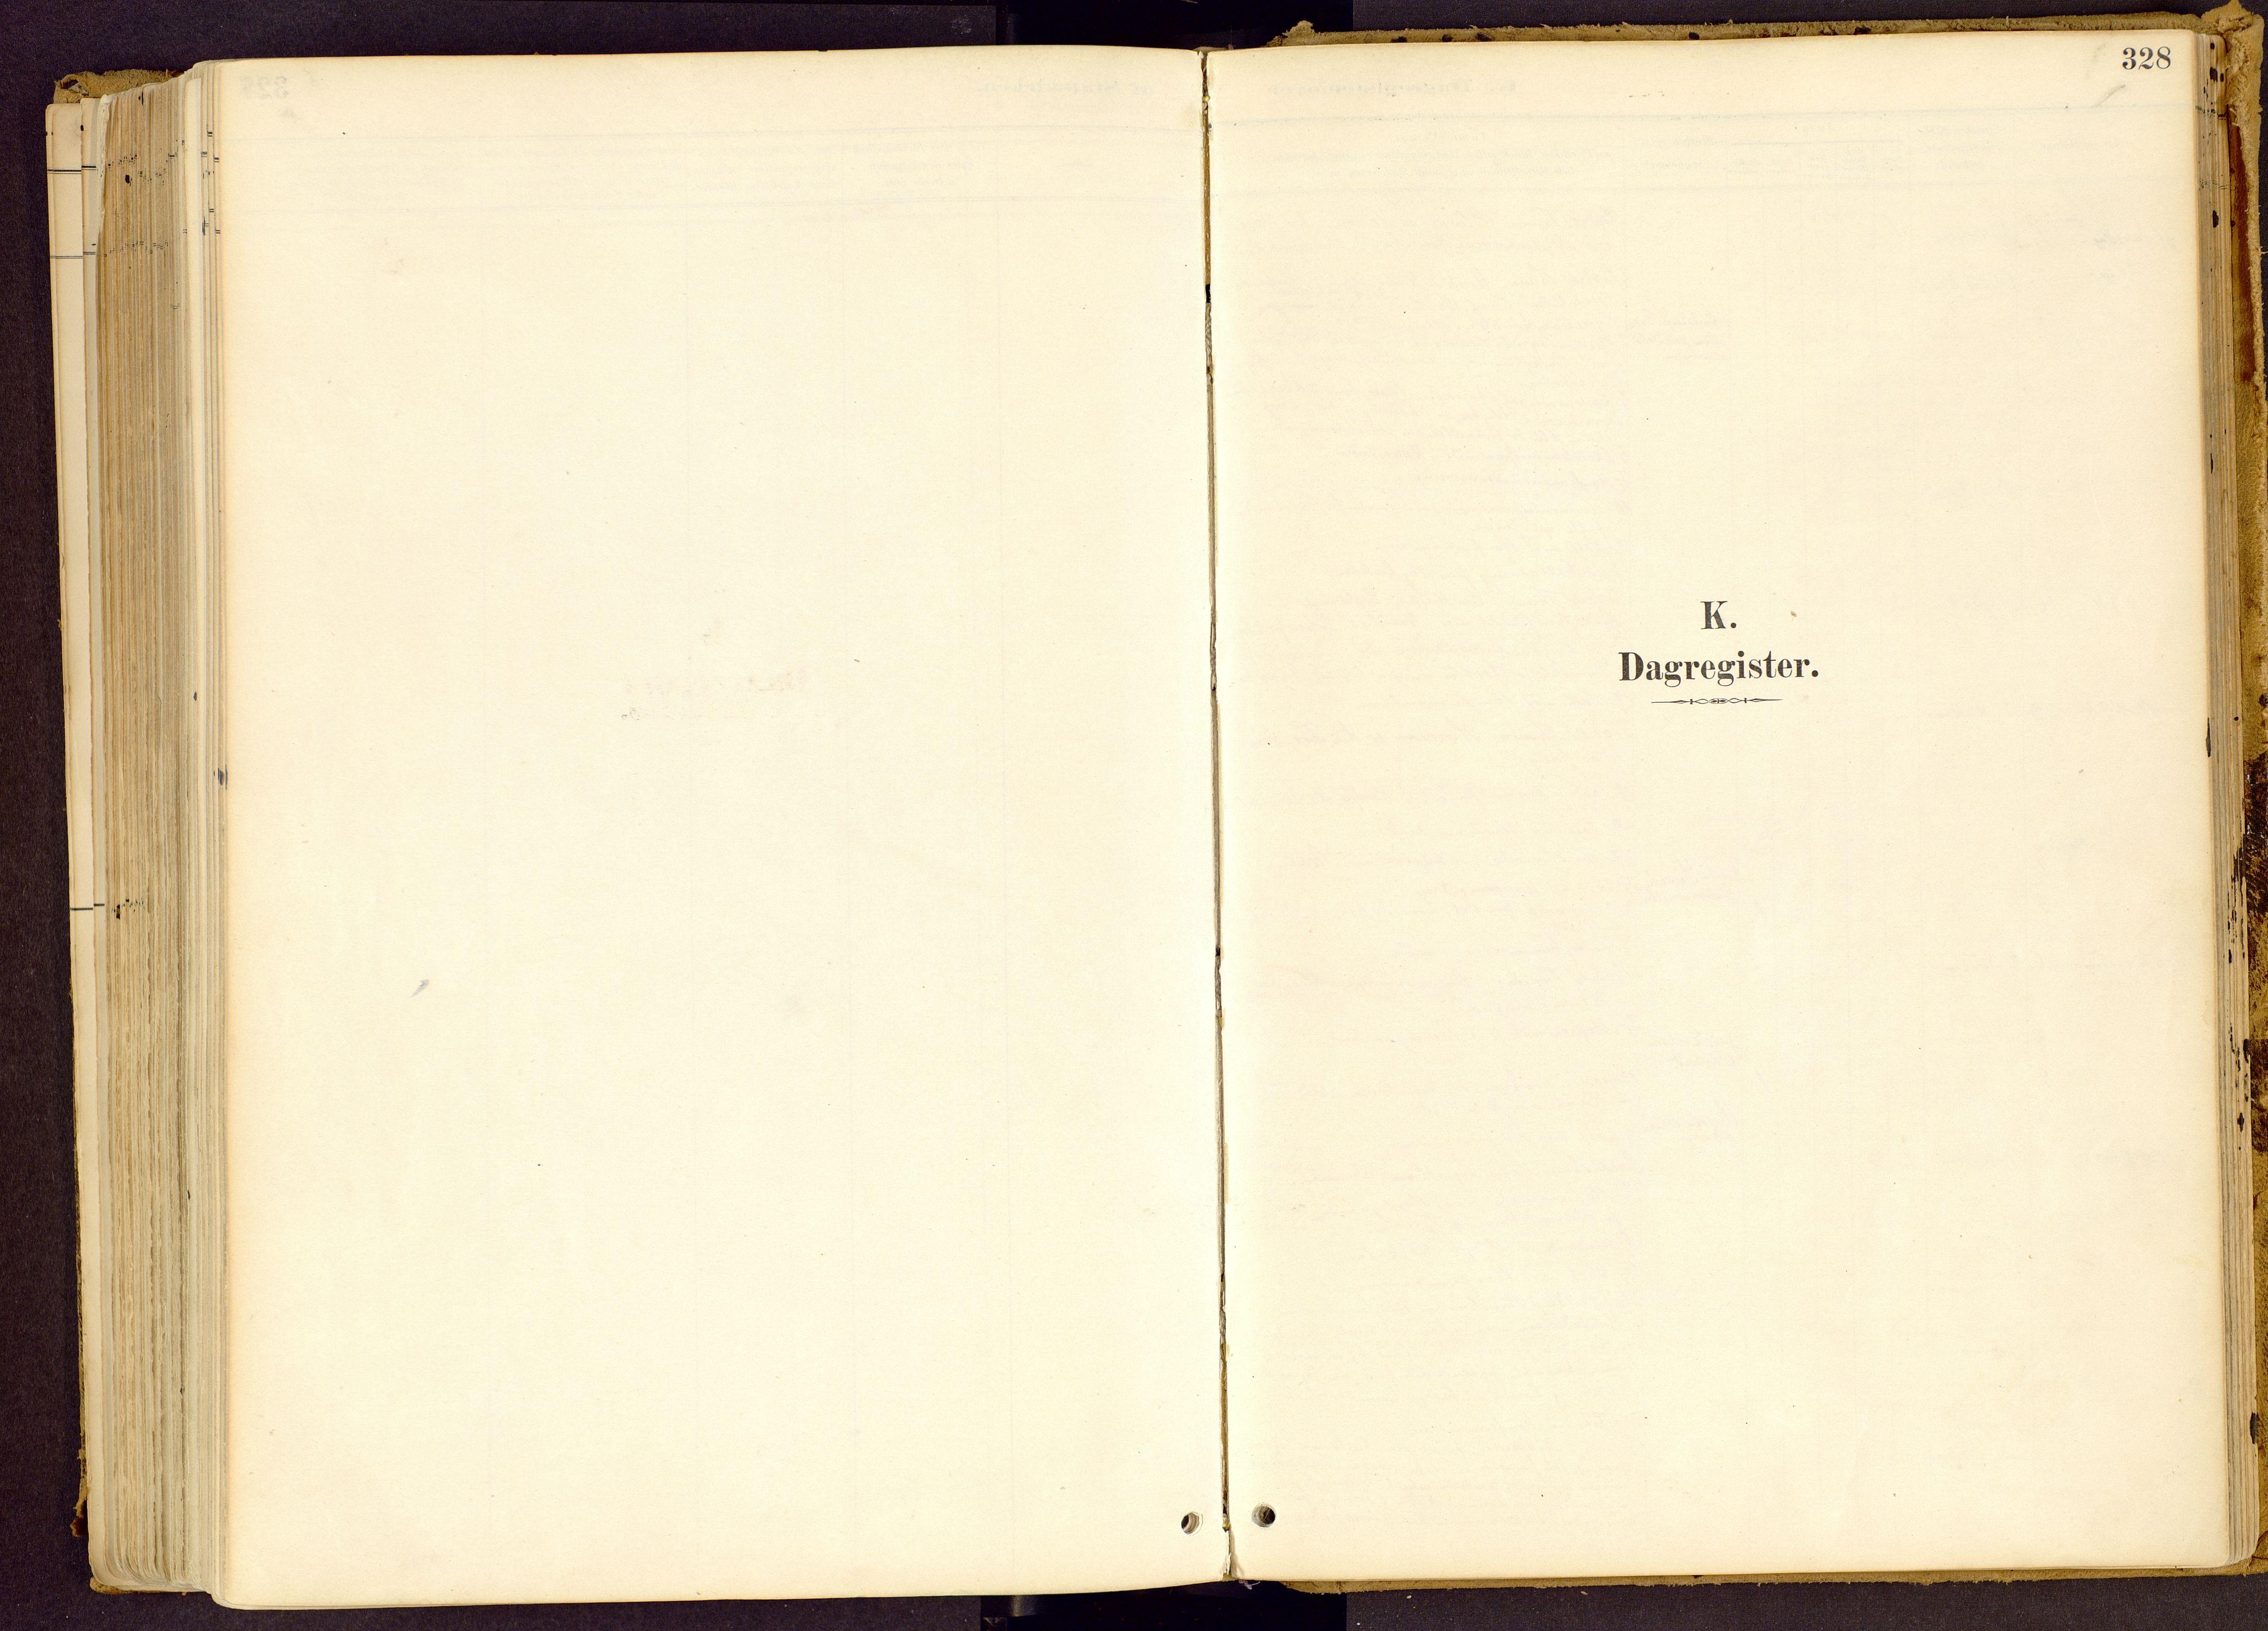 SAH, Vestre Gausdal prestekontor, Ministerialbok nr. 1, 1887-1914, s. 328